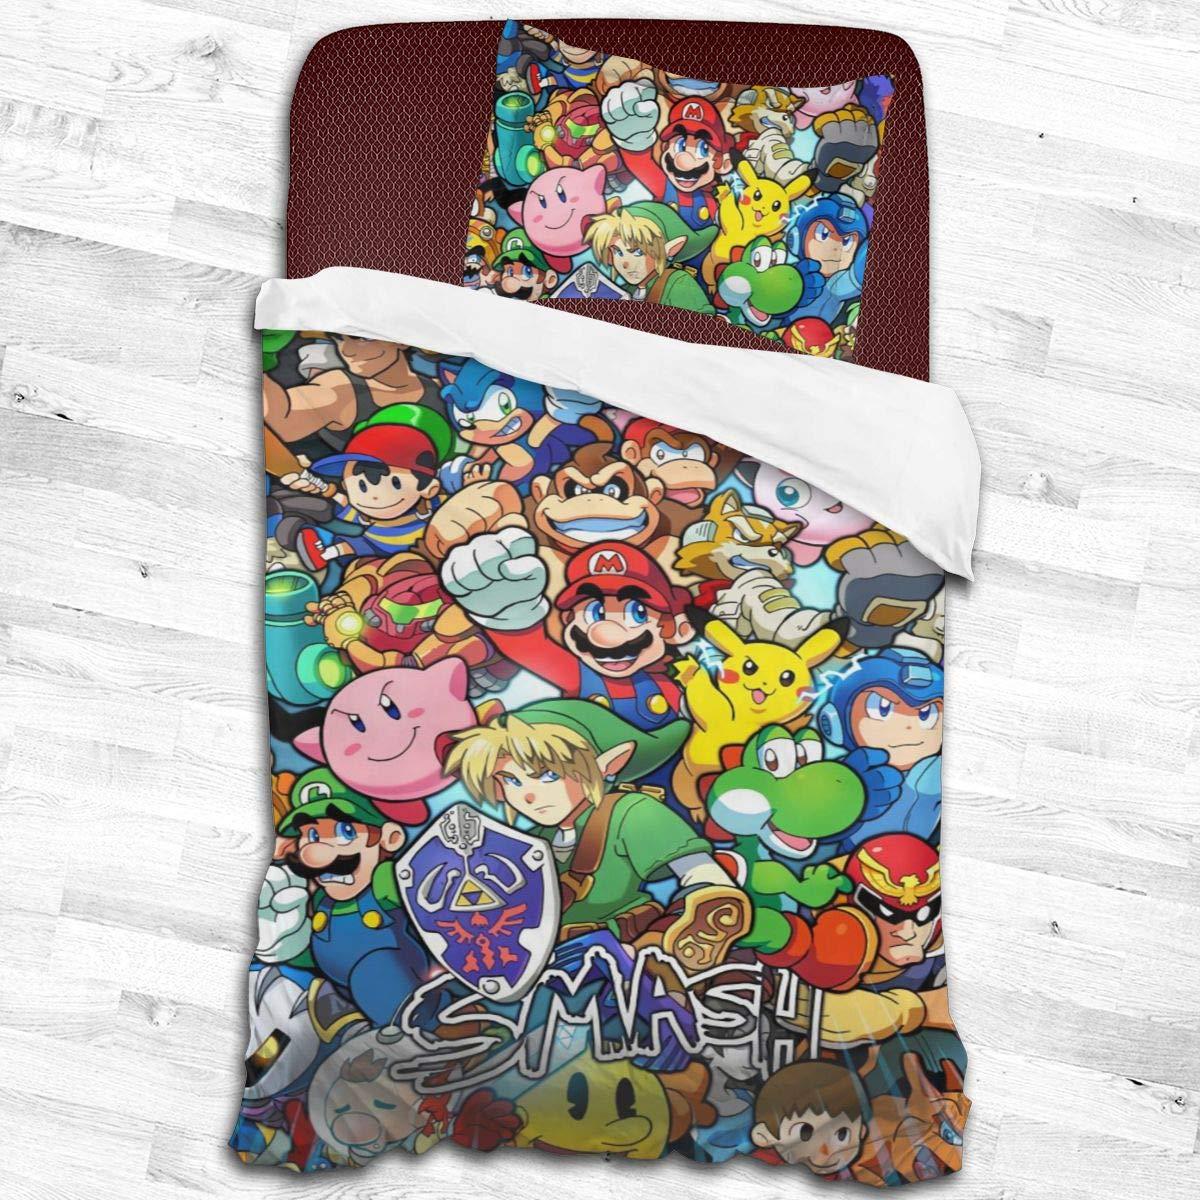 Yellowbiubiubiu The Legend of Zelda Sonic Pikachu Super Mario Smash Bros Kirby 2 Piece Bedding Set Ultra Soft Zipper Closure Bedding Set 3D Single Print Bedding Set Single Bed with 1 Pillow Shams Set